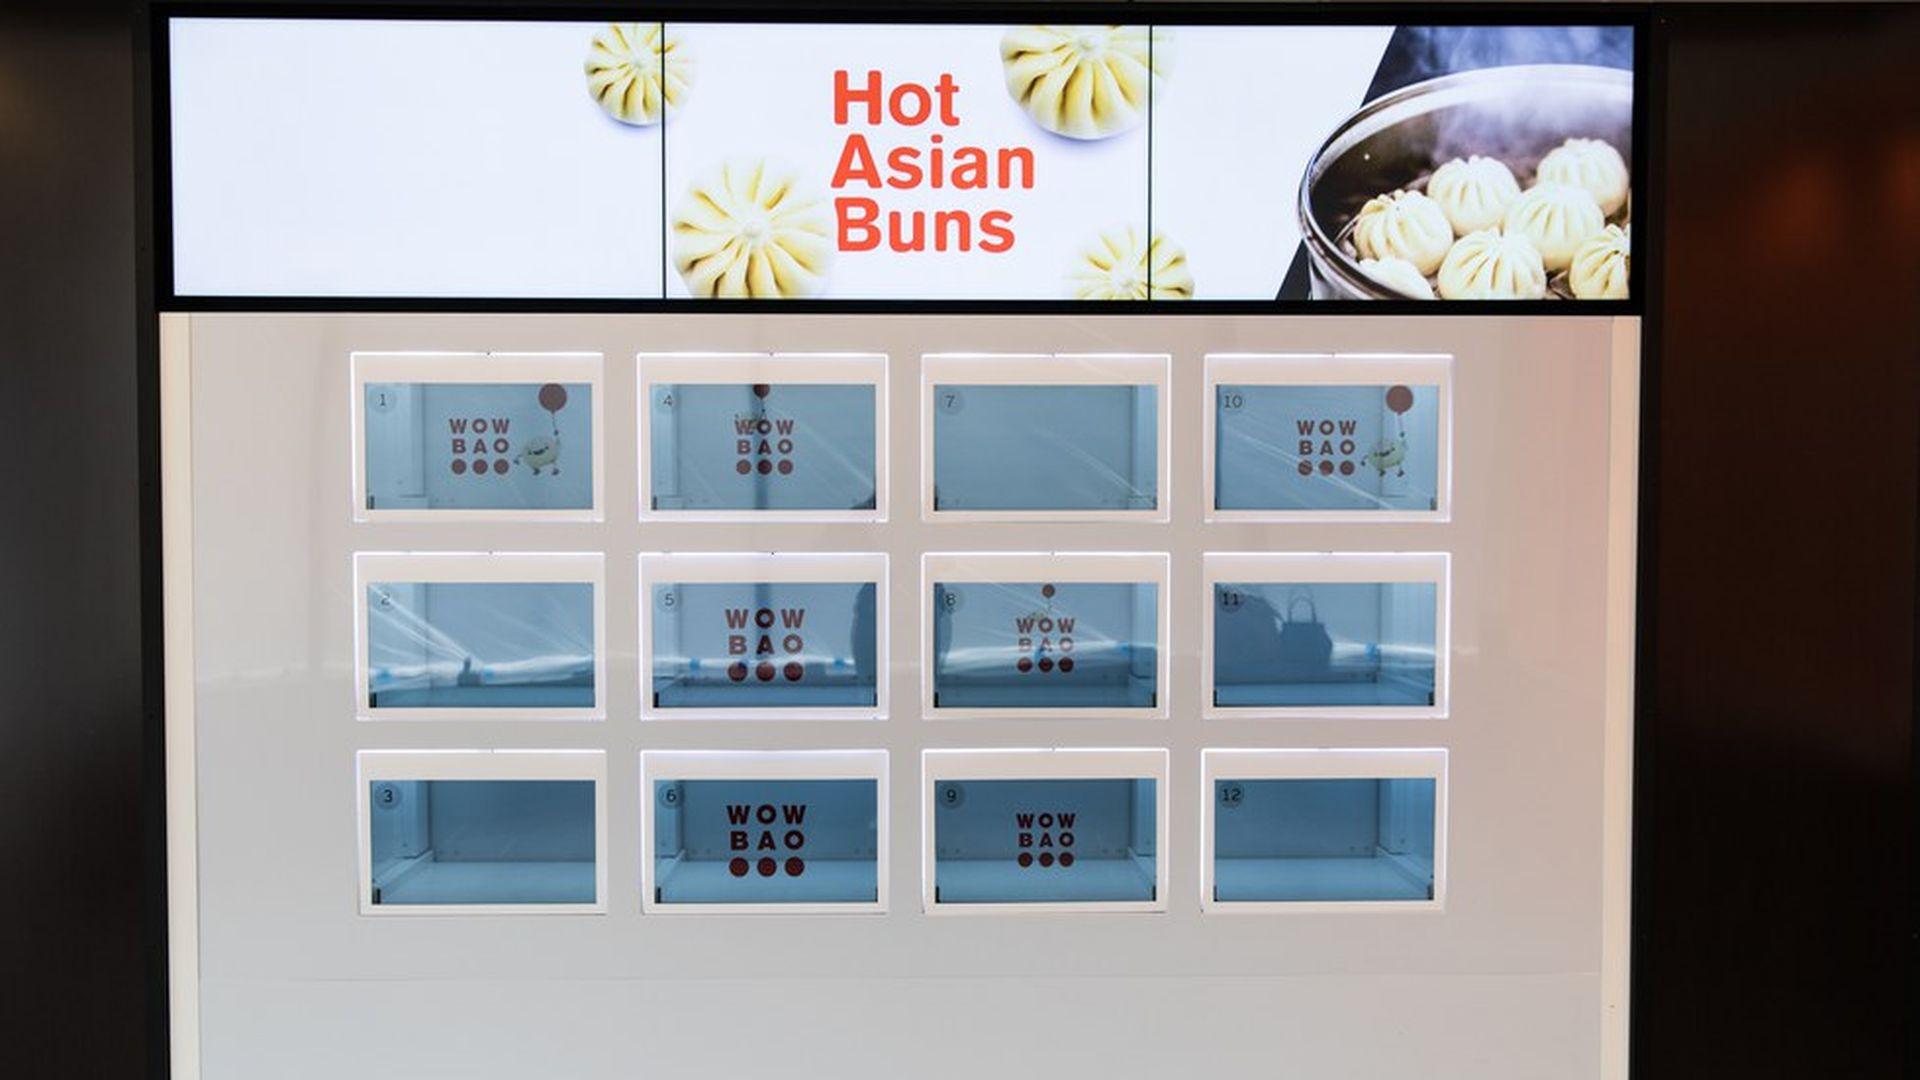 Eatsa's robot-assisted tech for restaurants heads to Chicago